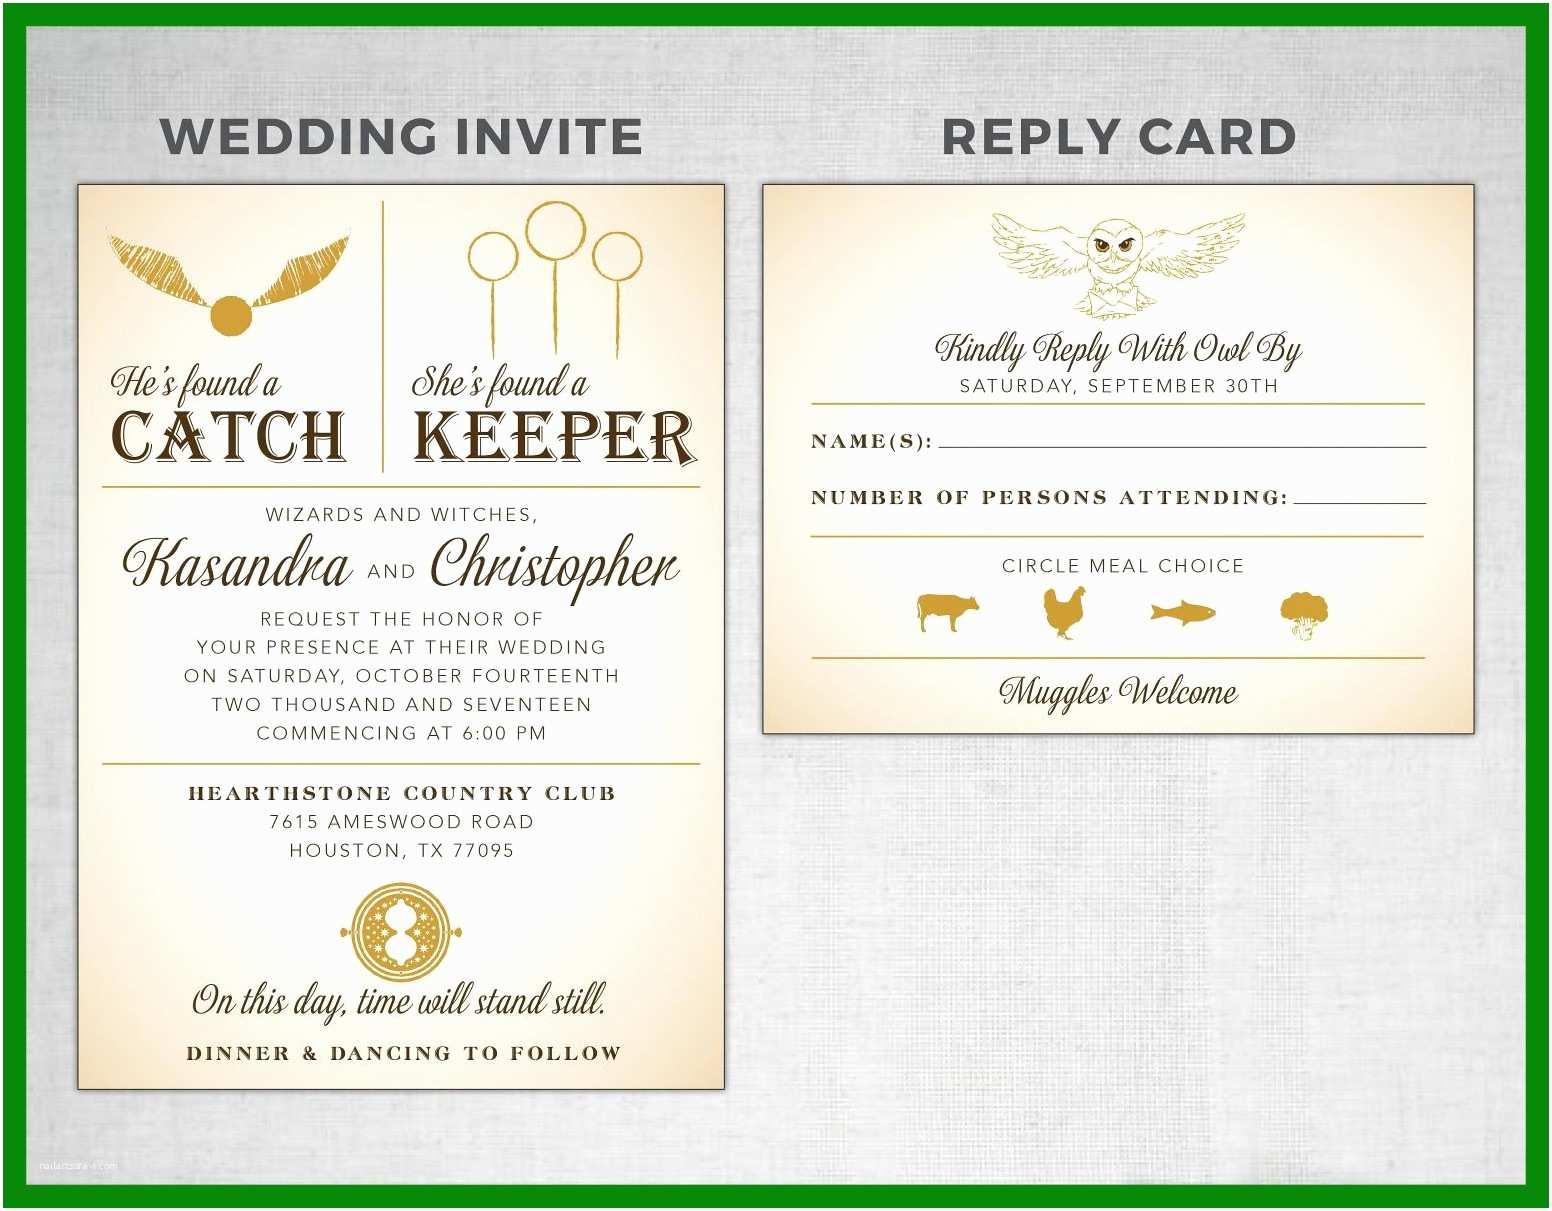 Hardcover Wedding Invitations Diy Hardcover Wedding Invitations Premium Wedding Ideas